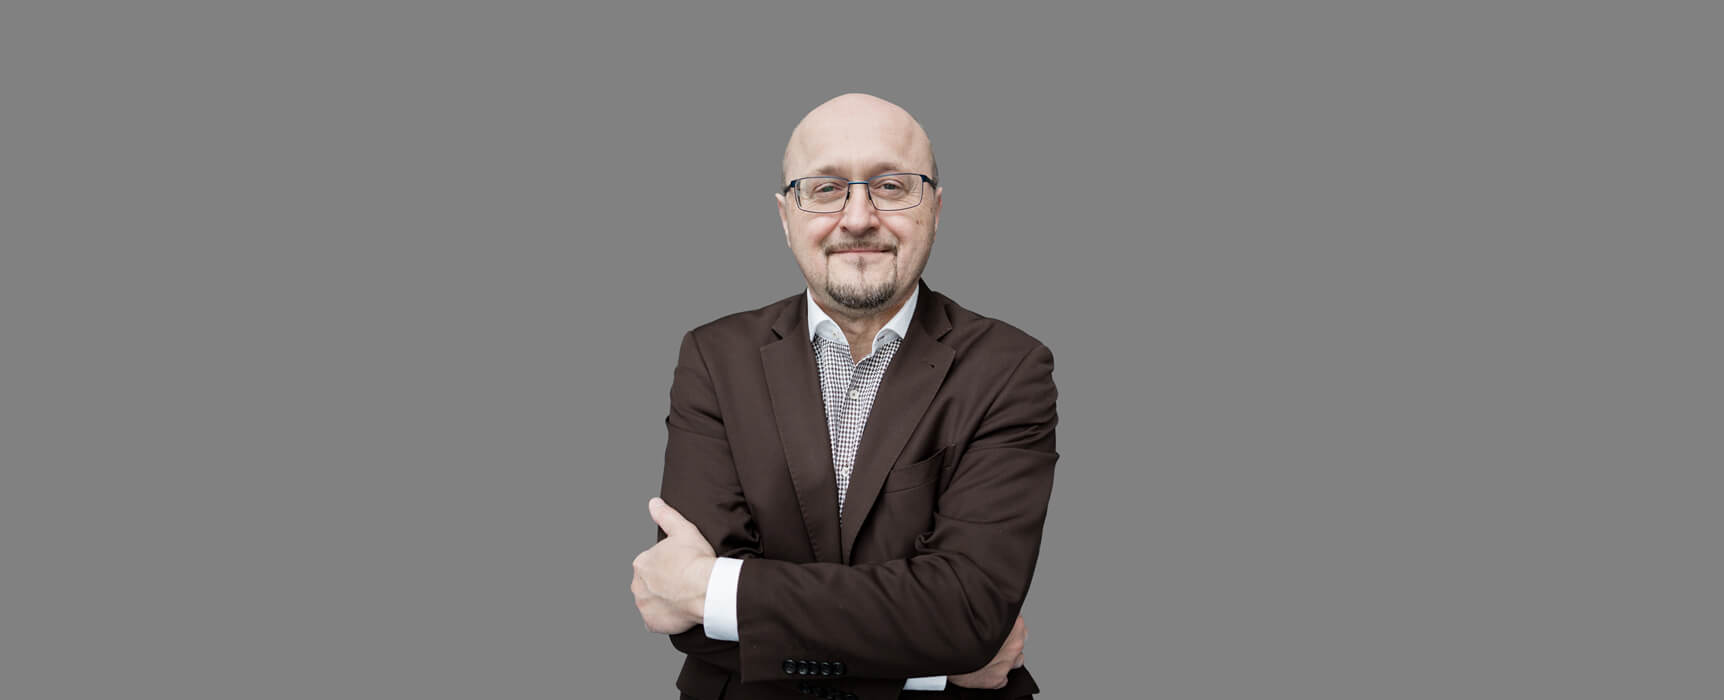 AC assistenza & consulting: Der italienische Unternehmensberater Roberto Tissino